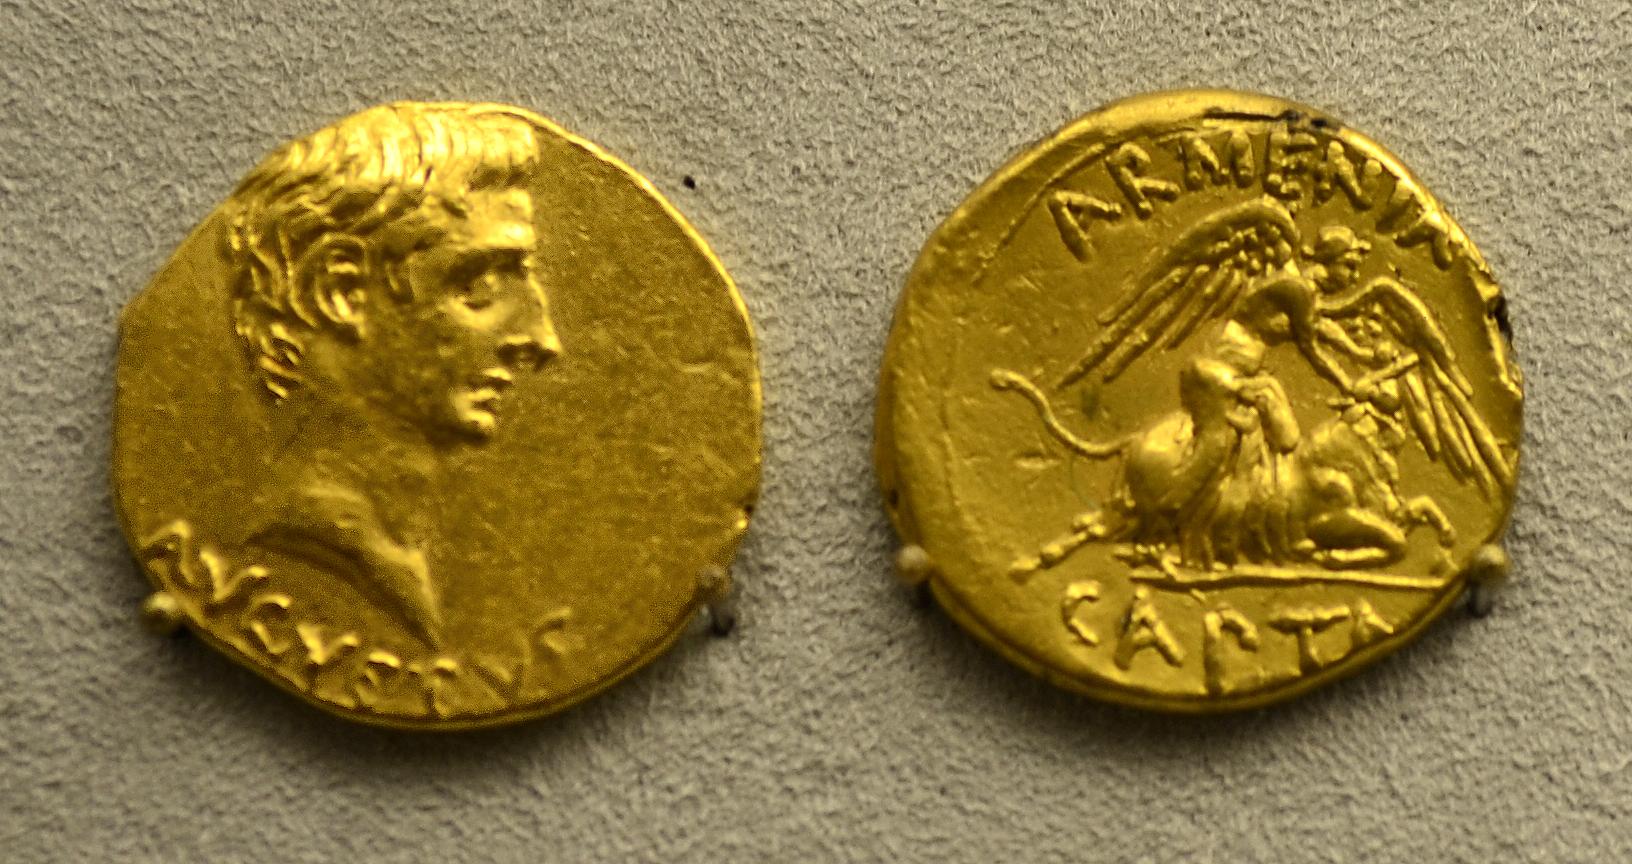 201209071749a Berlin Pergamonmuseum, Aureus, FO Pergamon, kaiserzeitlich, VS AVGVSTVS,.RS ARMENIA CAPTA, 19-18 v.u.Z.jpg